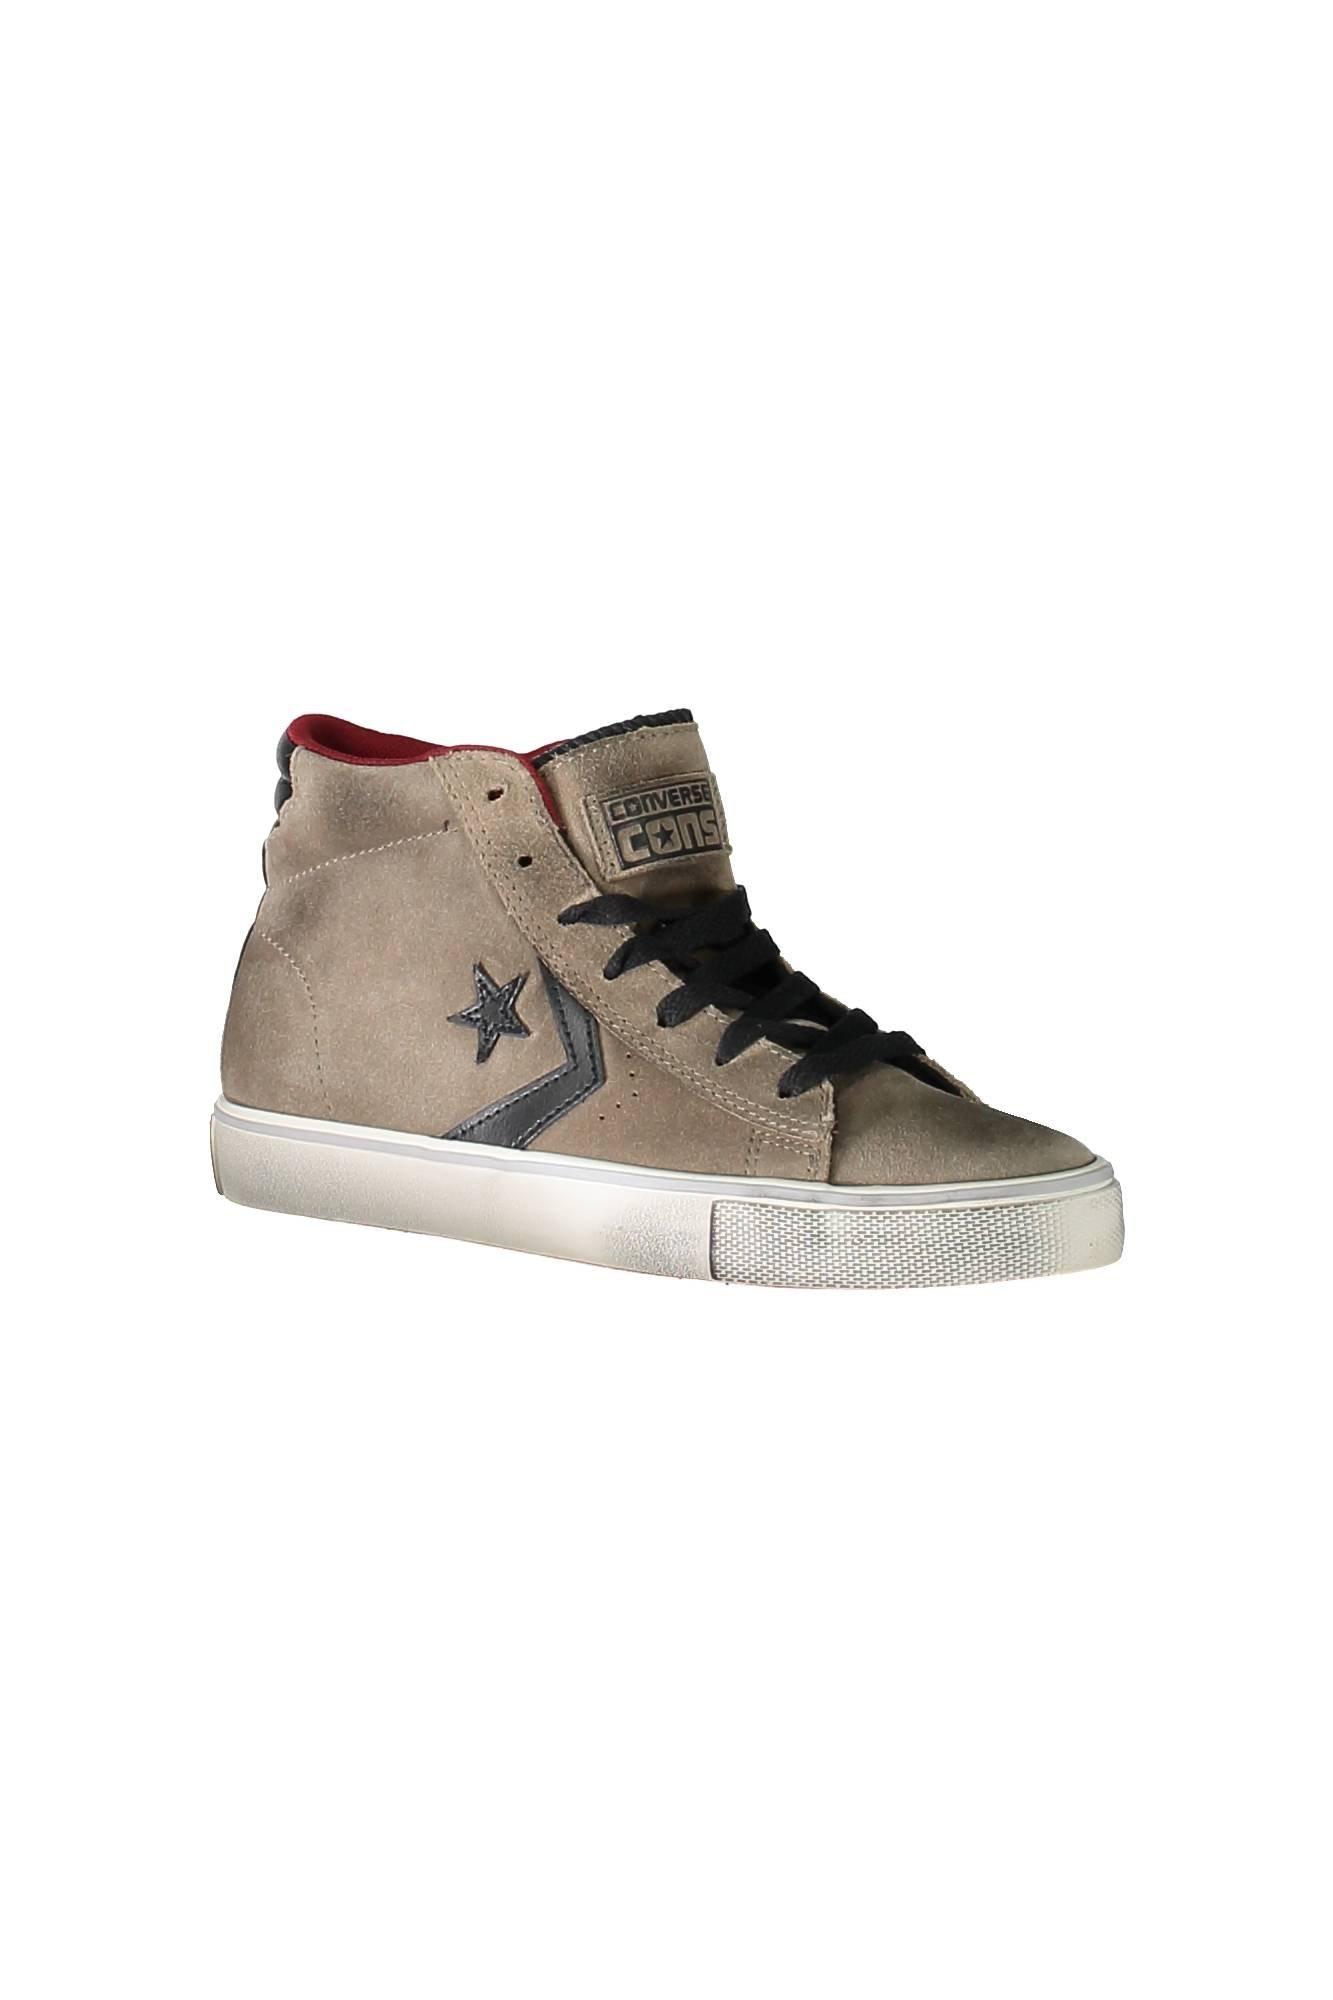 Converse Pro Leather Vulc – Zapatillas Abotinadas Hombre